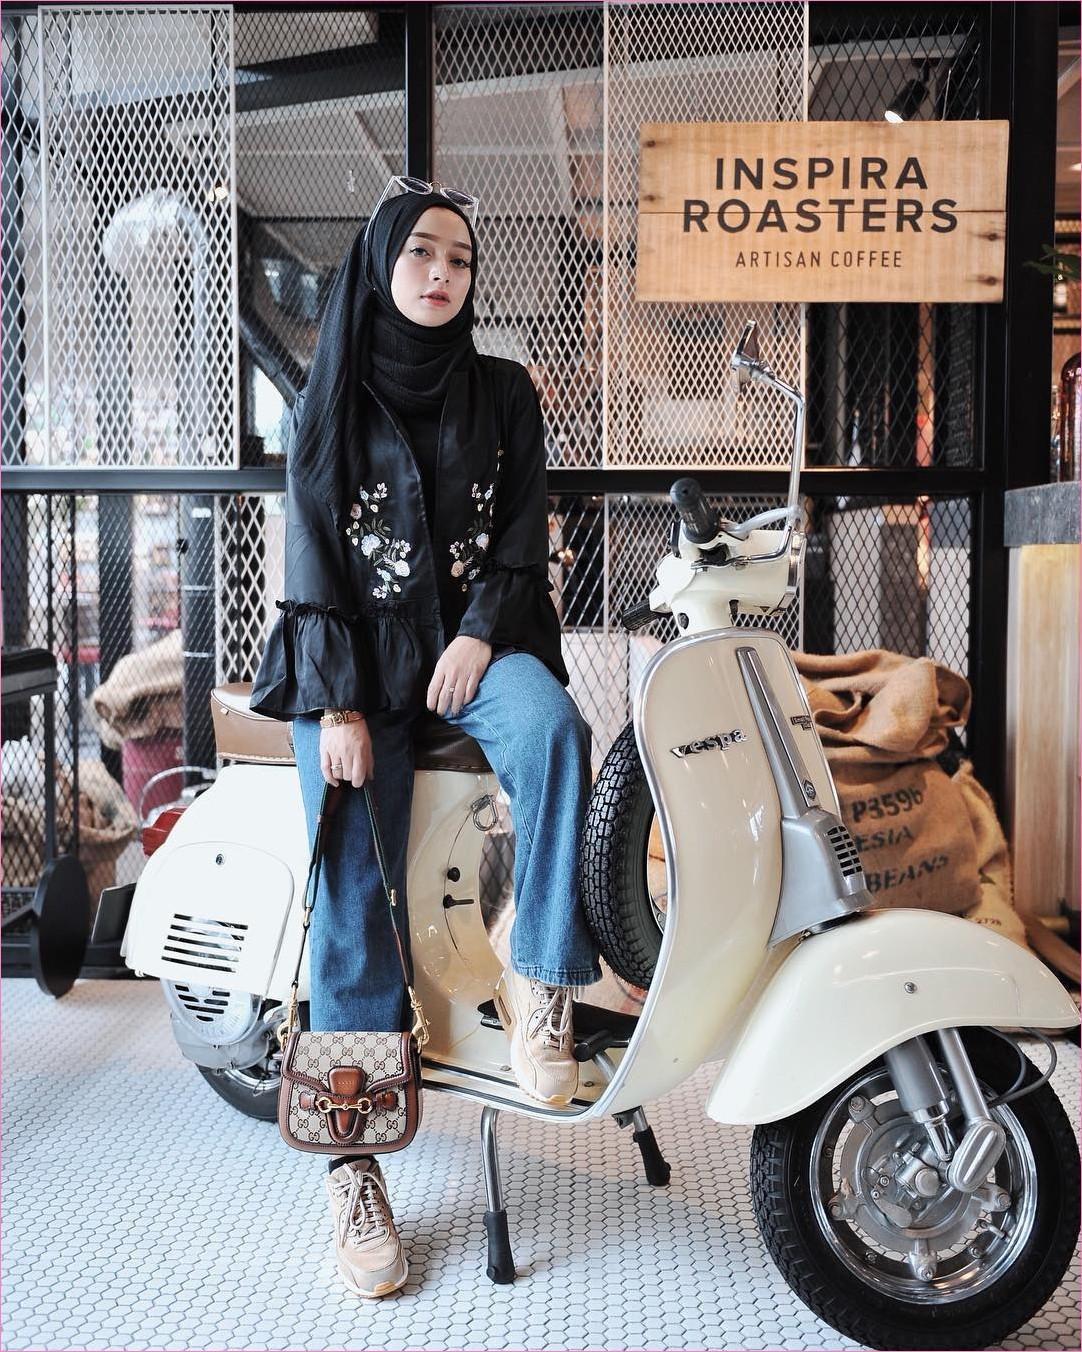 Outfit Kerudung Pashmina Ala Selebgram 2018 hijab pashmina rawis top baju blouse lengan terompet hitam kaccamata putih jam tangan celana jeans denim slingbags kets sneakers coklat muda kaos kaki ciput rajut ootd trendy vespa